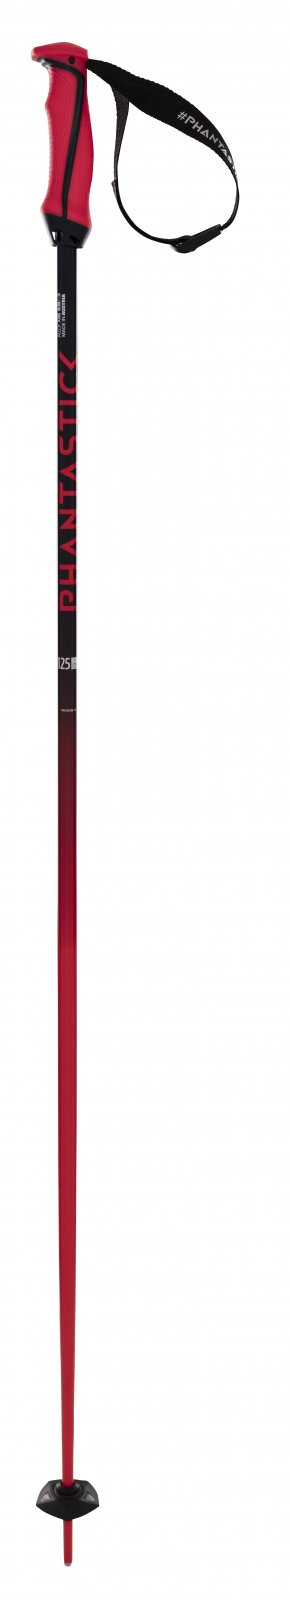 Volkl Phantastick Ski Poles 2021